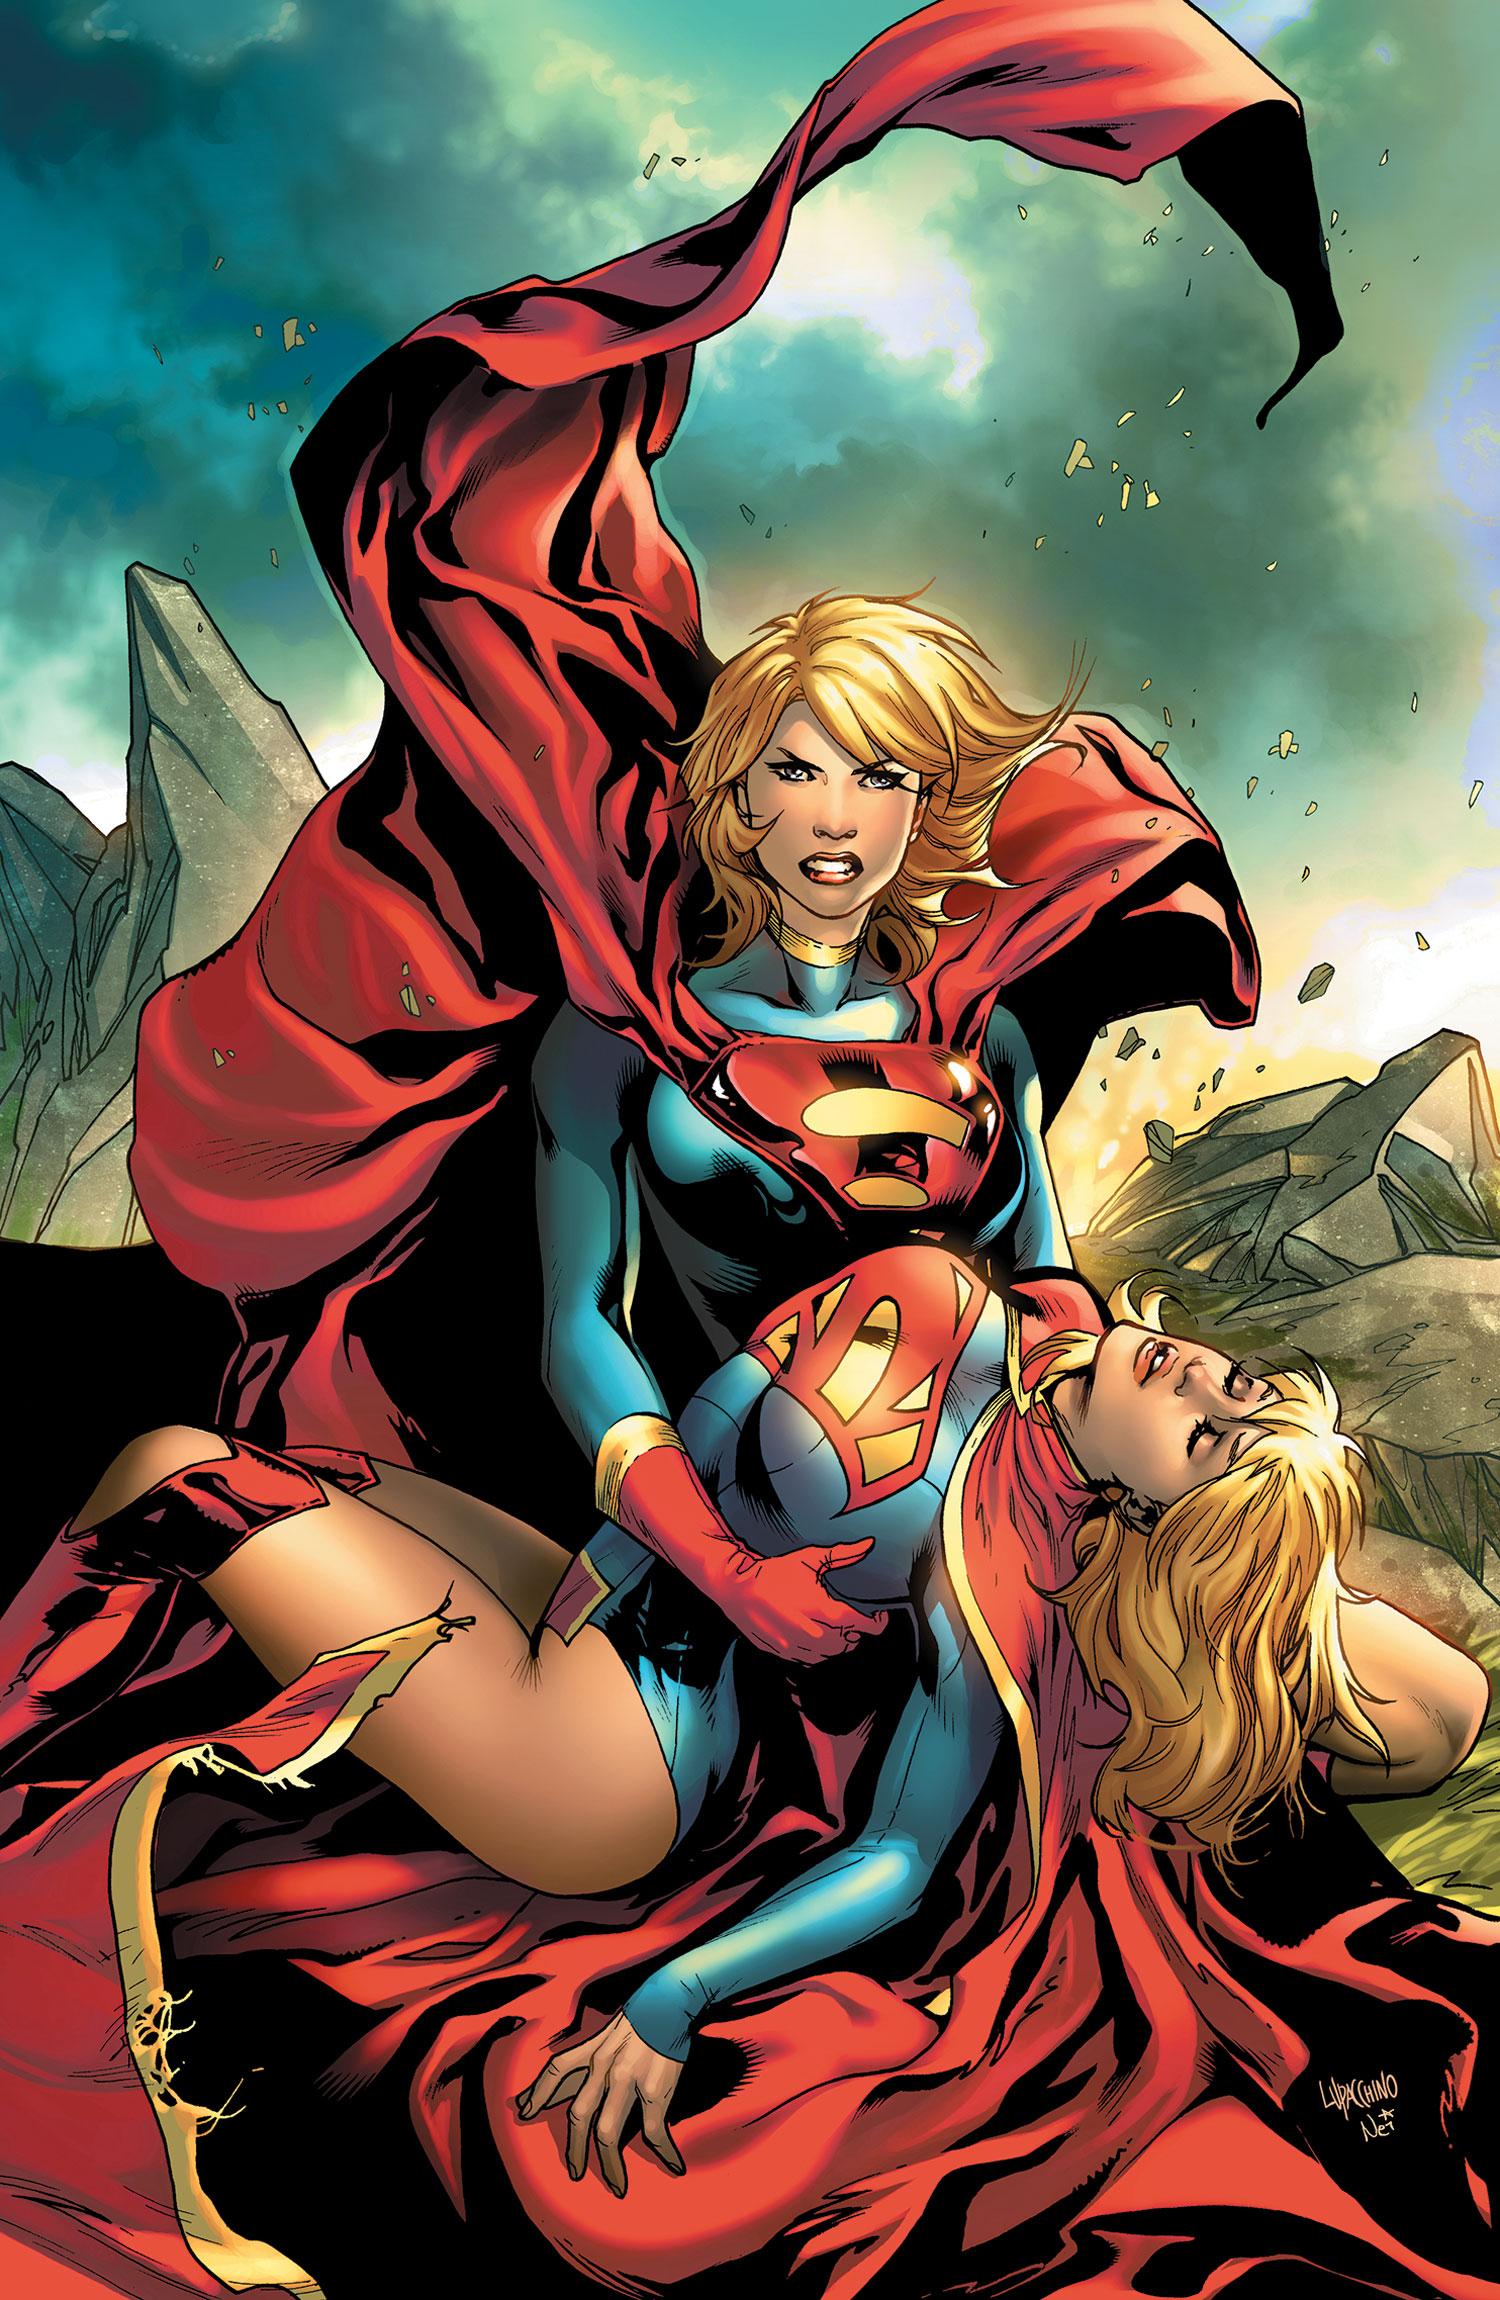 Supergirl Vol 6 20 Textless.jpg